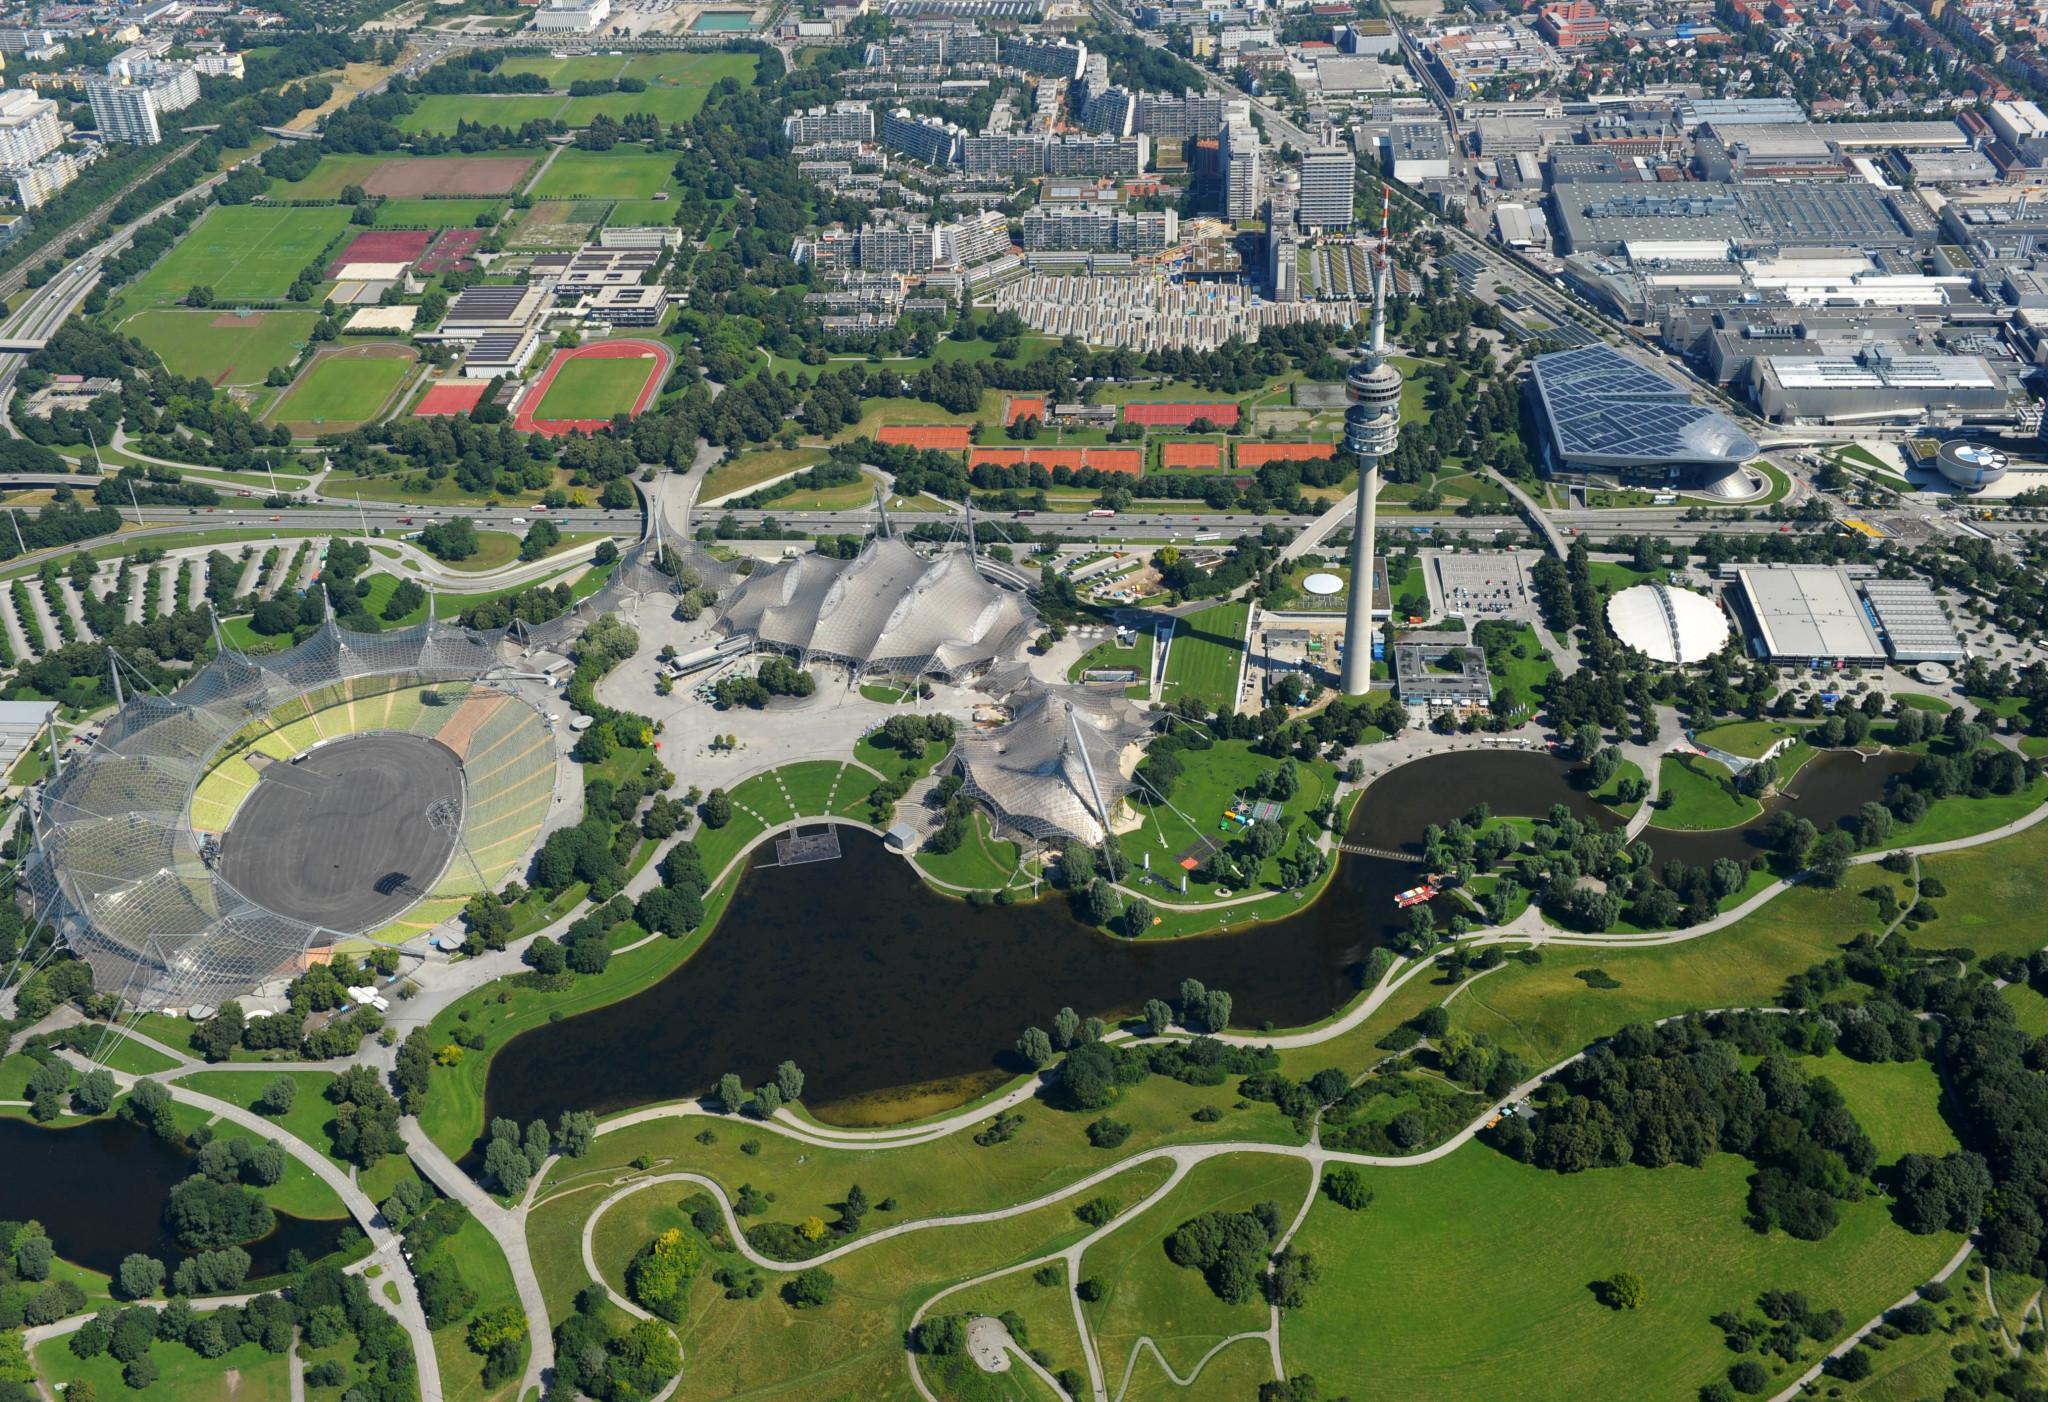 Bavarian Sports Minister hopeful of full stadiums at Munich 2022